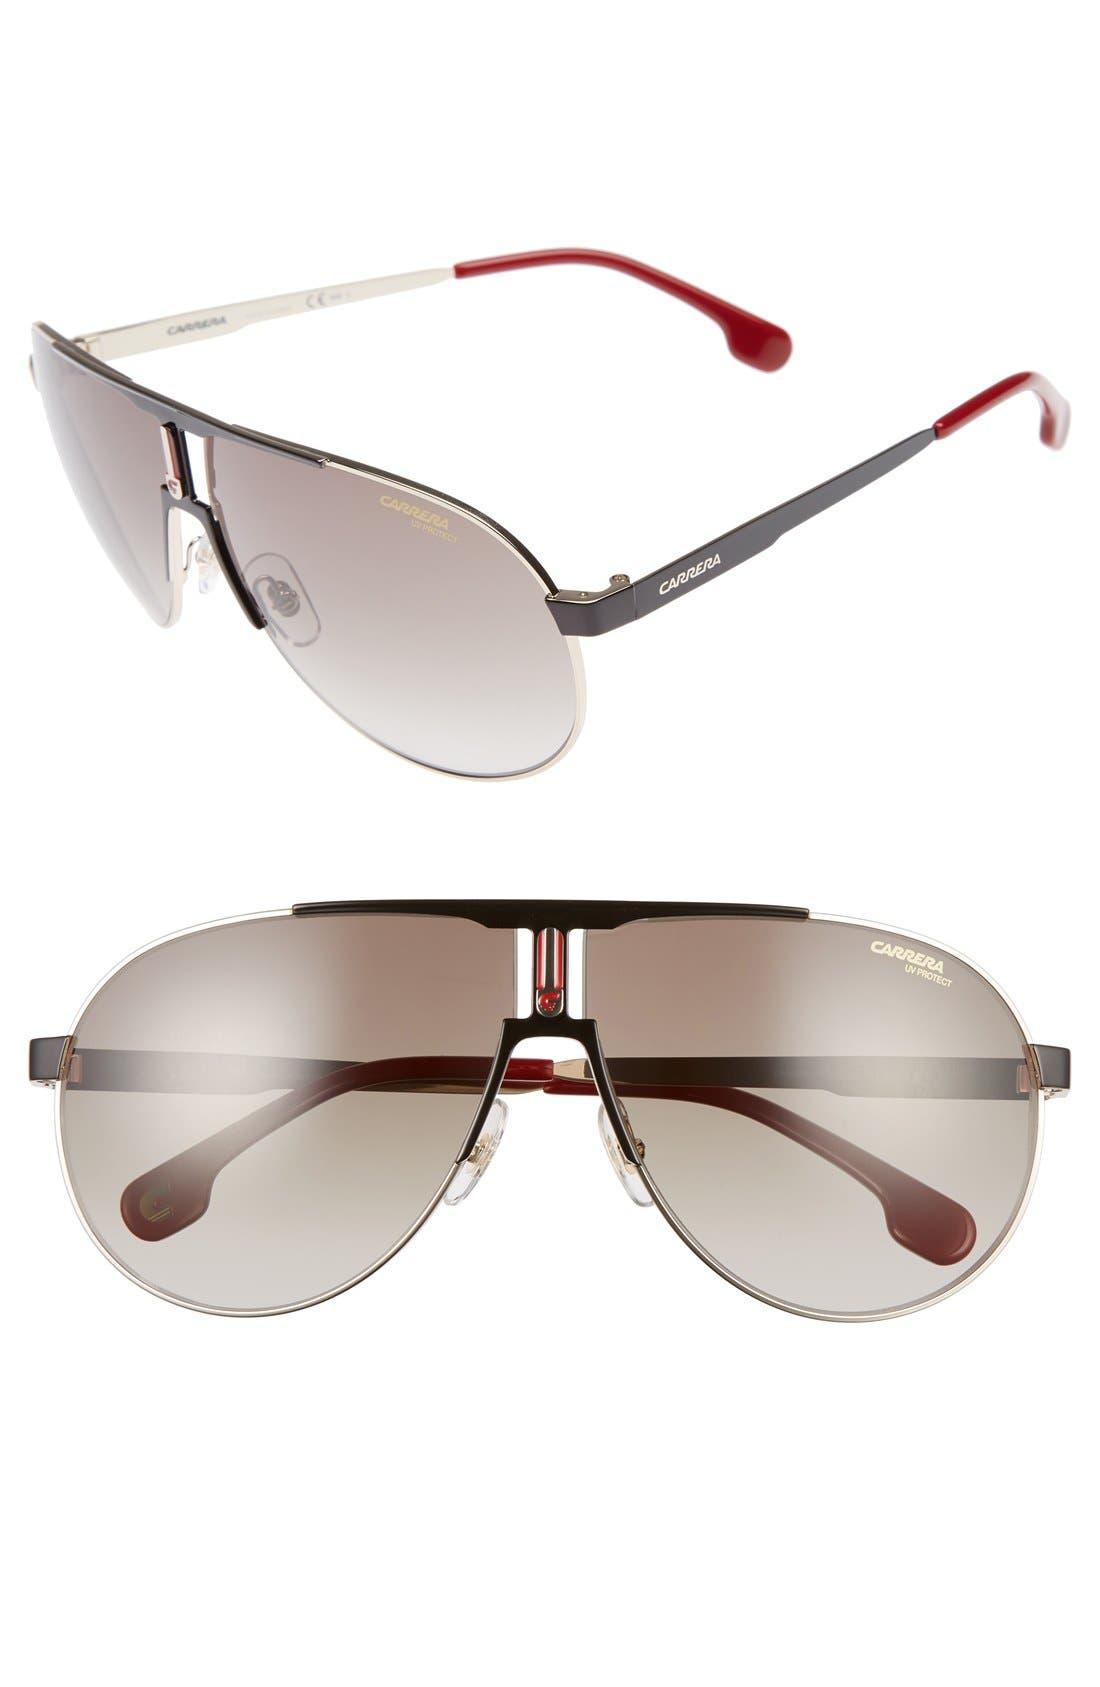 Main Image - Carrera Eyewear 66mm Aviator Sunglasses